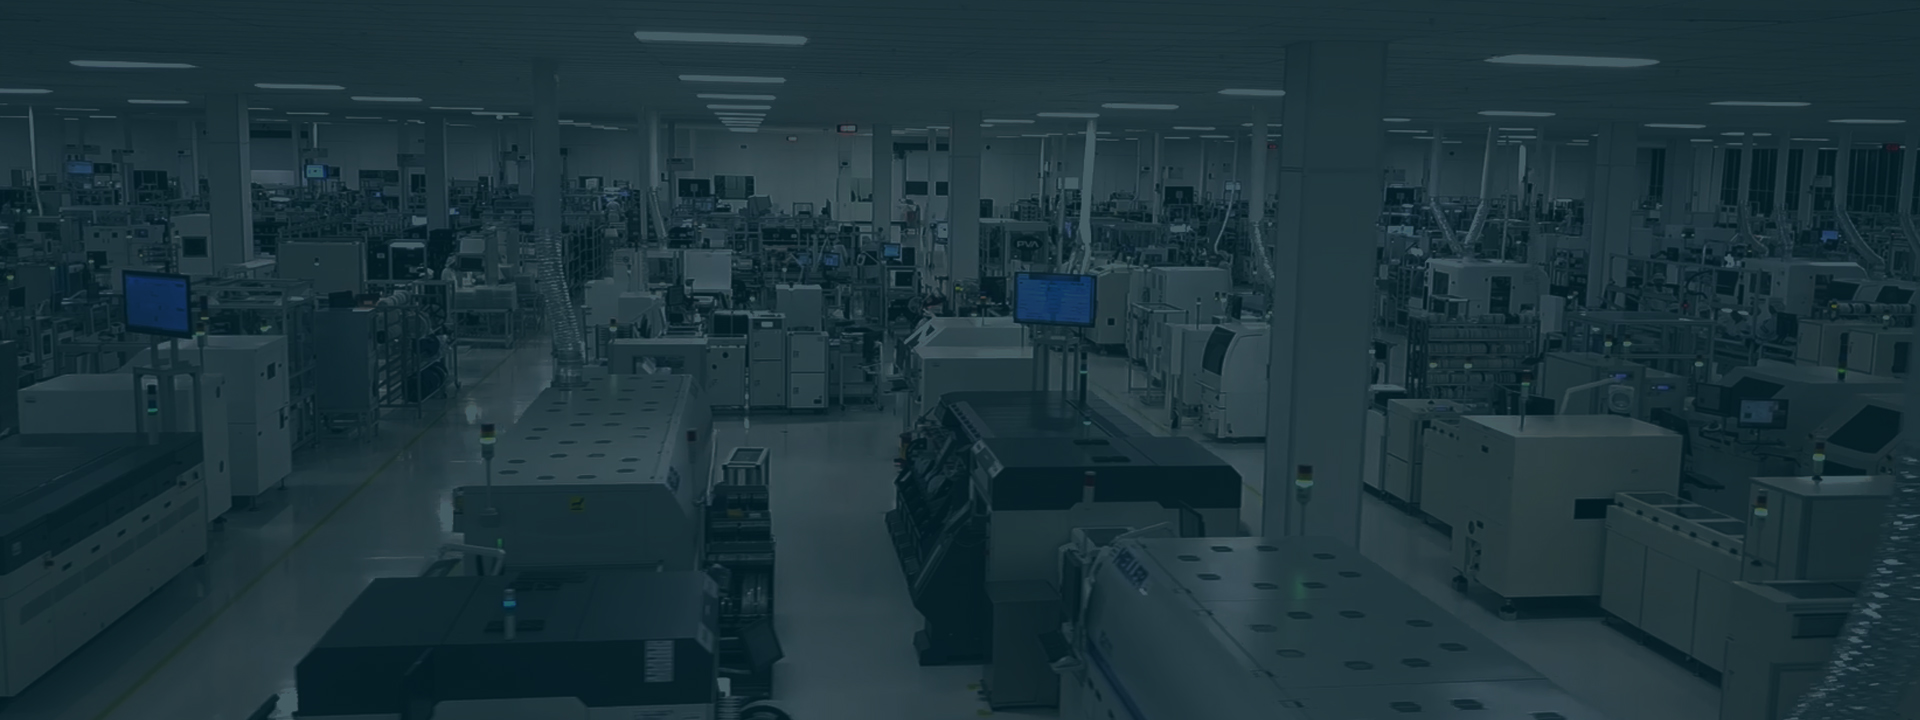 visteon-plant-manufacturing